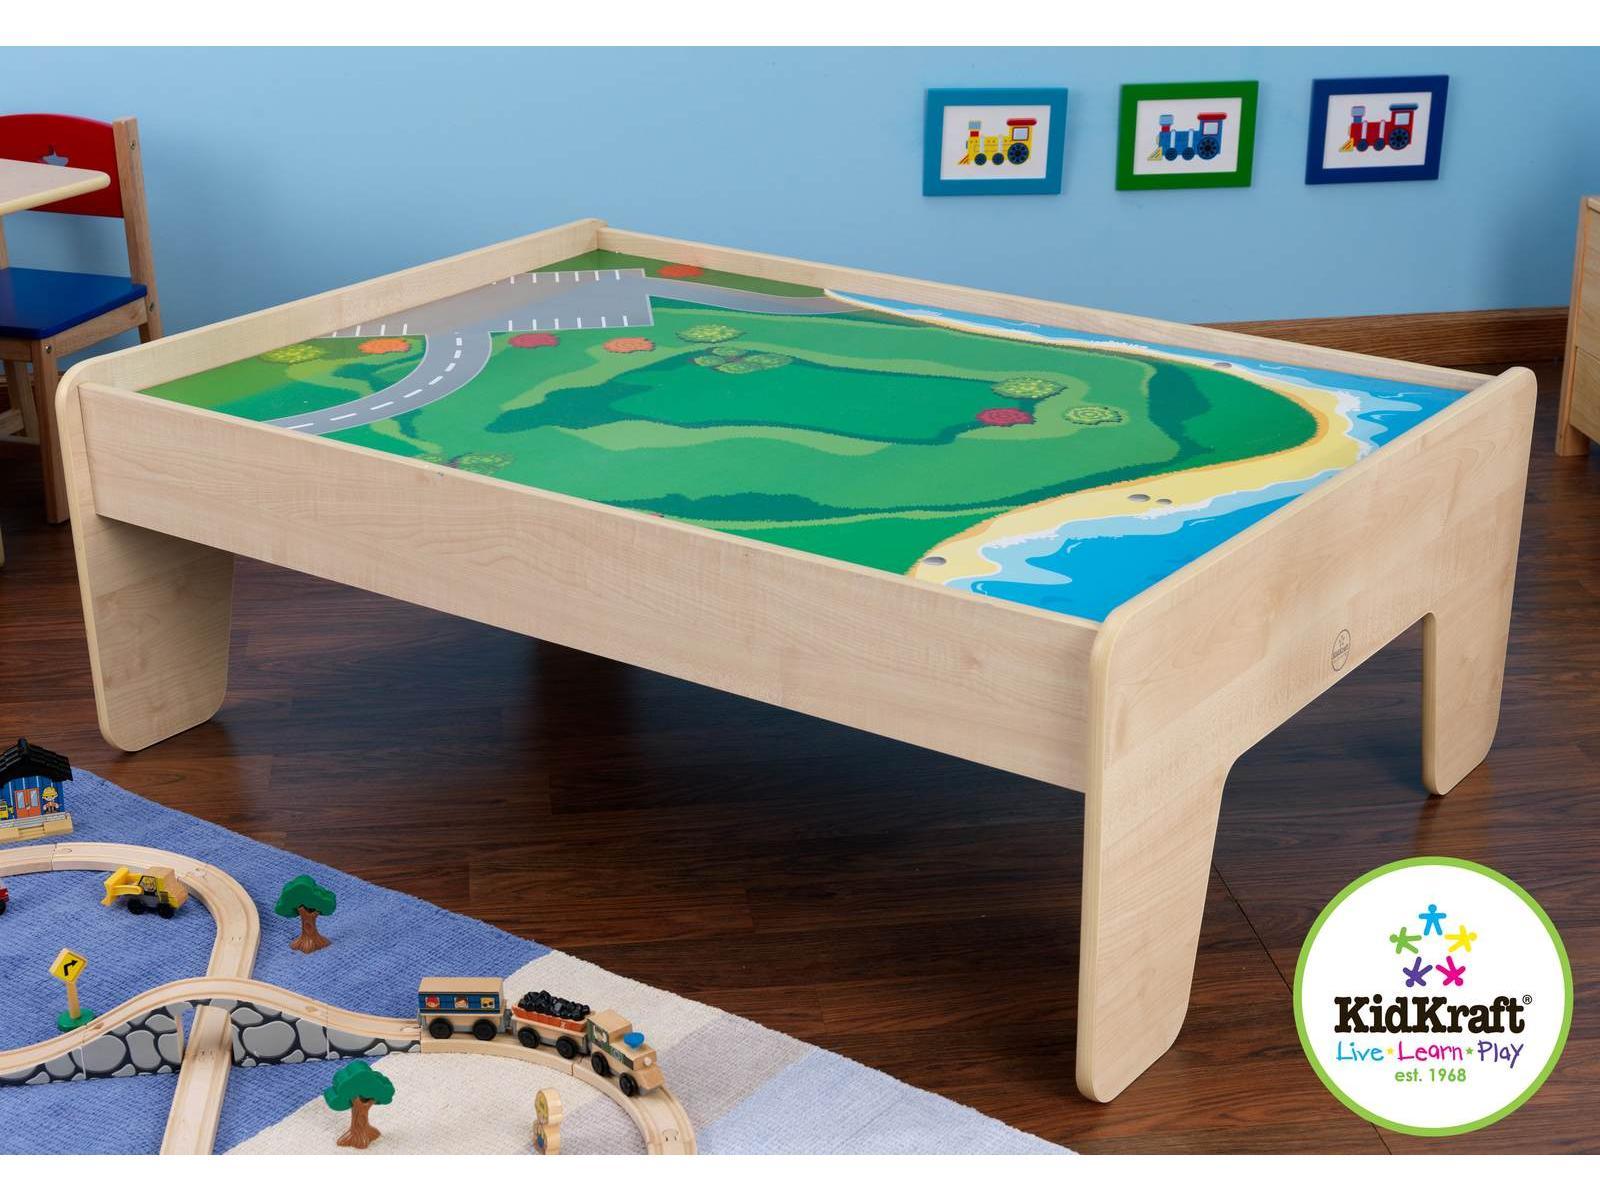 Kidskraft Train Table ... la collection circuits trains en bois kidkraft de la marque kidkraft